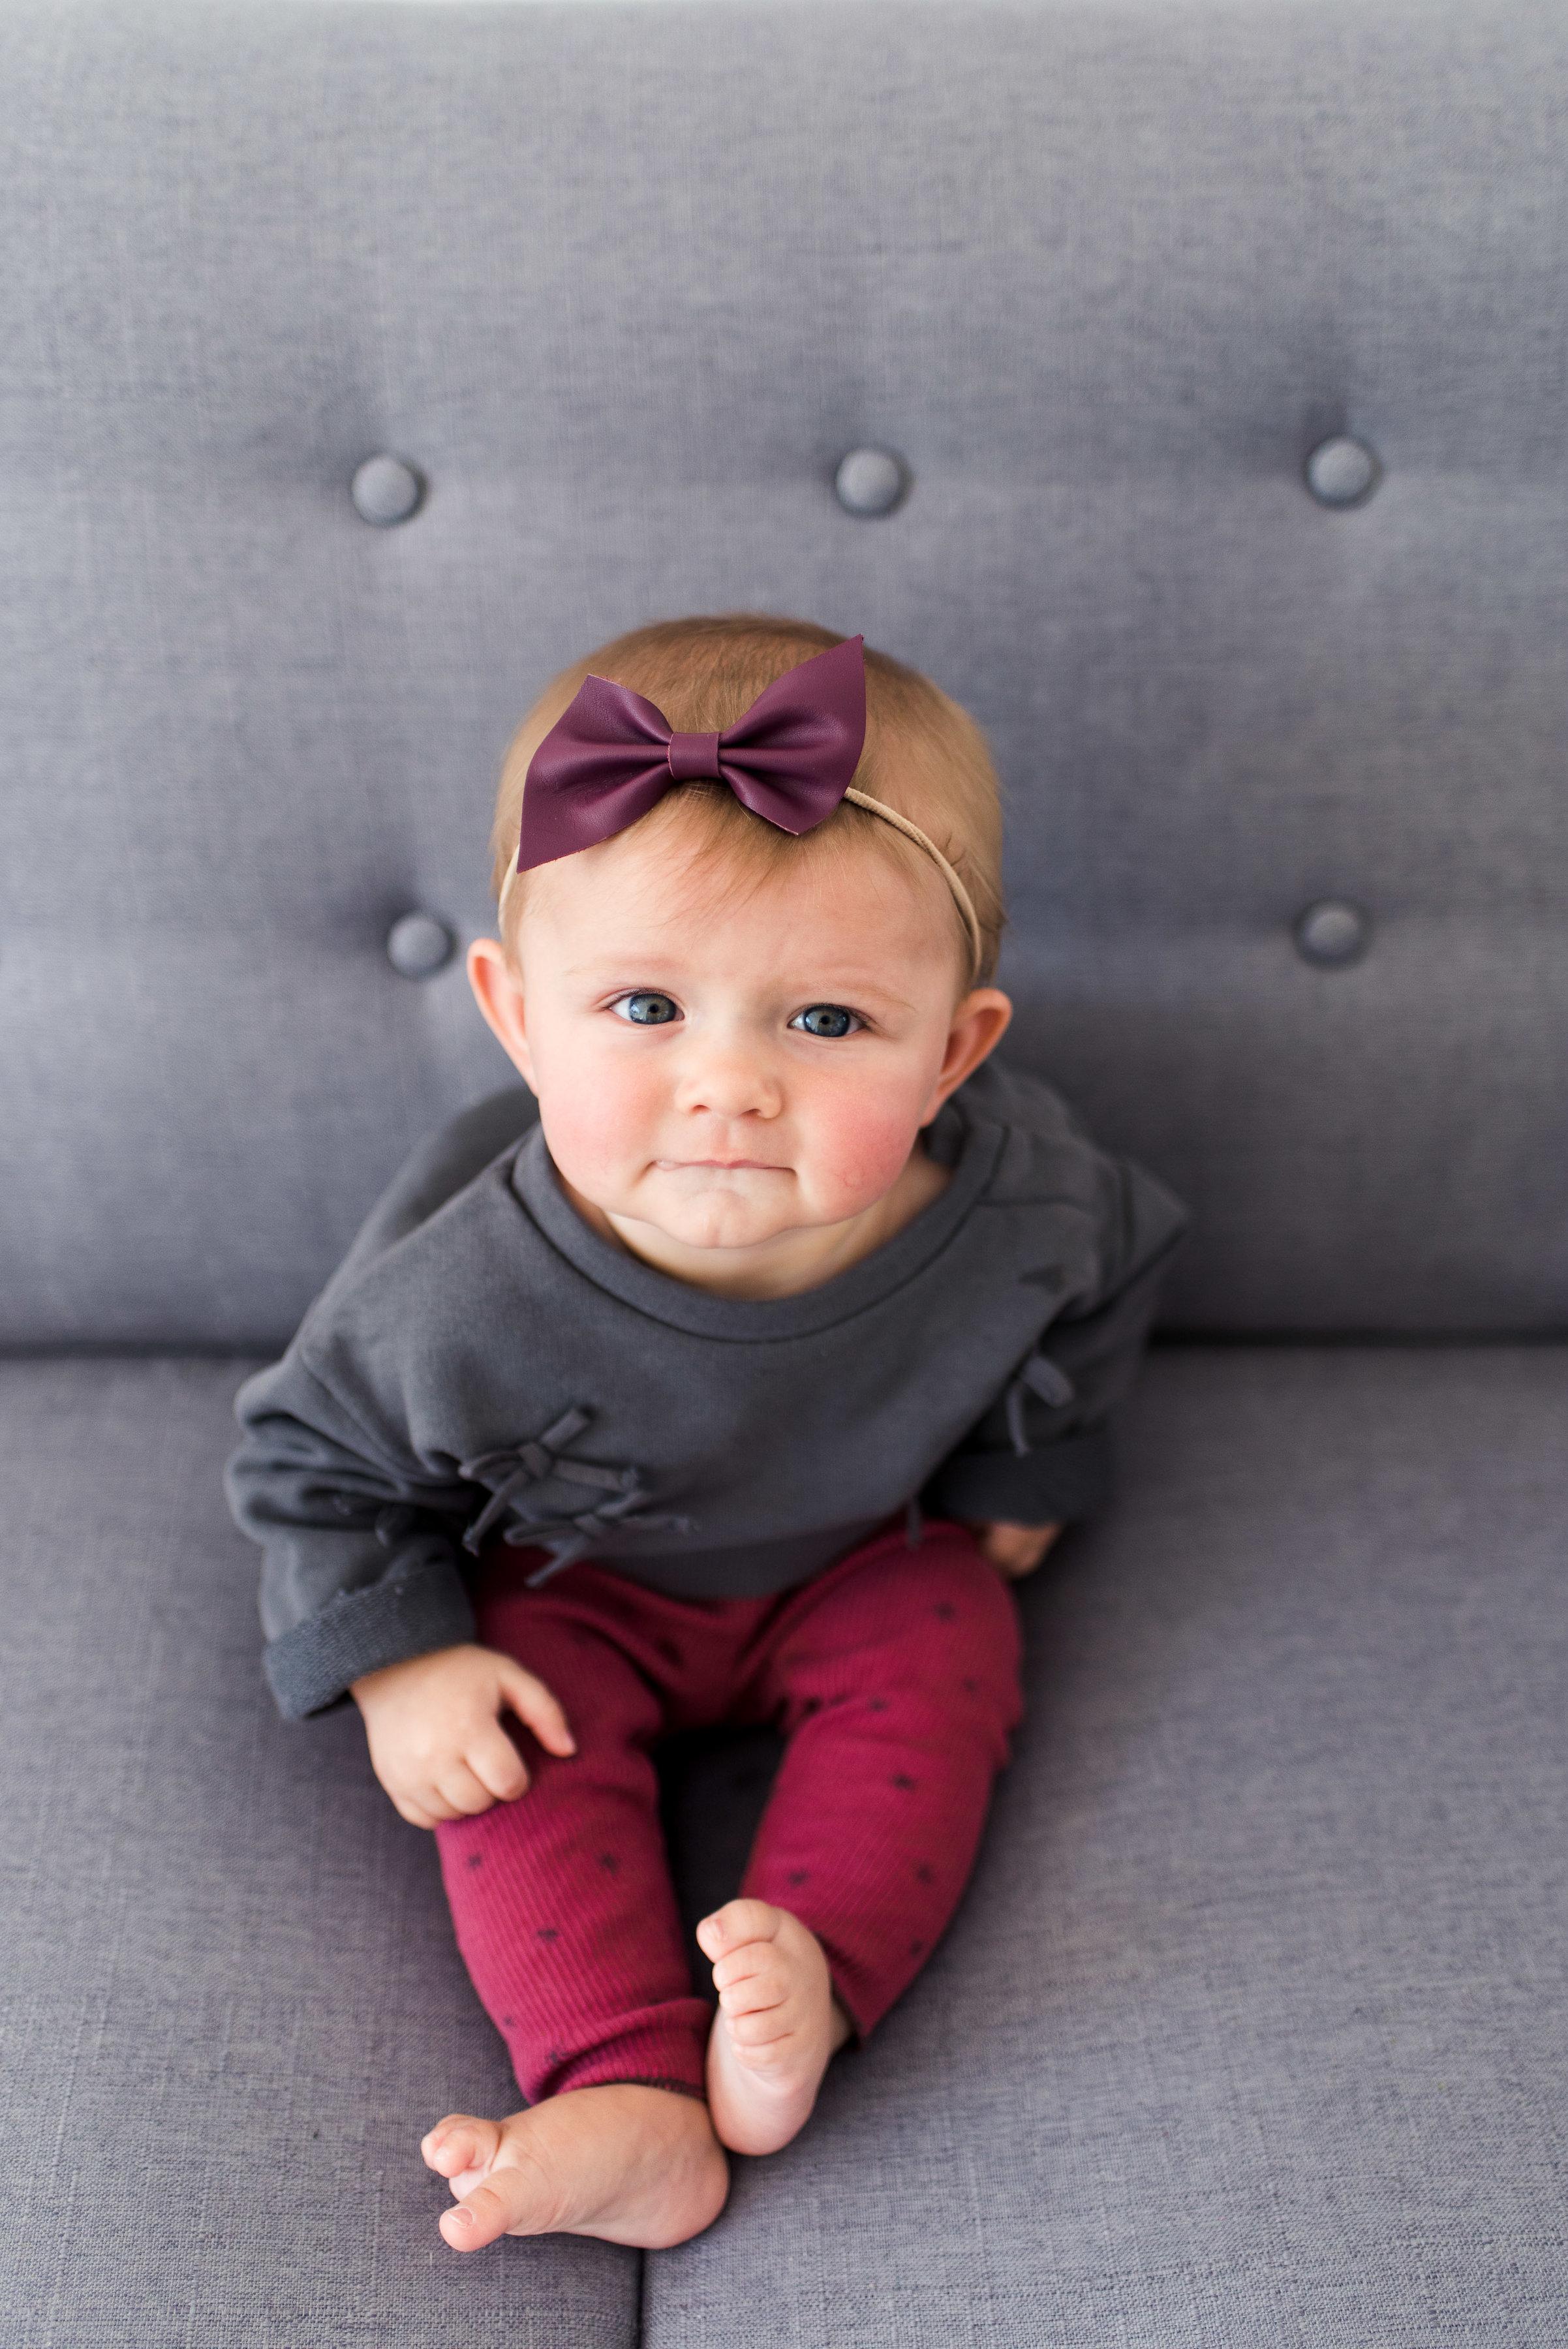 Close up look at the berry printed ribbed leggings: https://www.zara.com/us/en/kids/mini-%7C-0-12-months/knitwear/-c760002p4997572.html